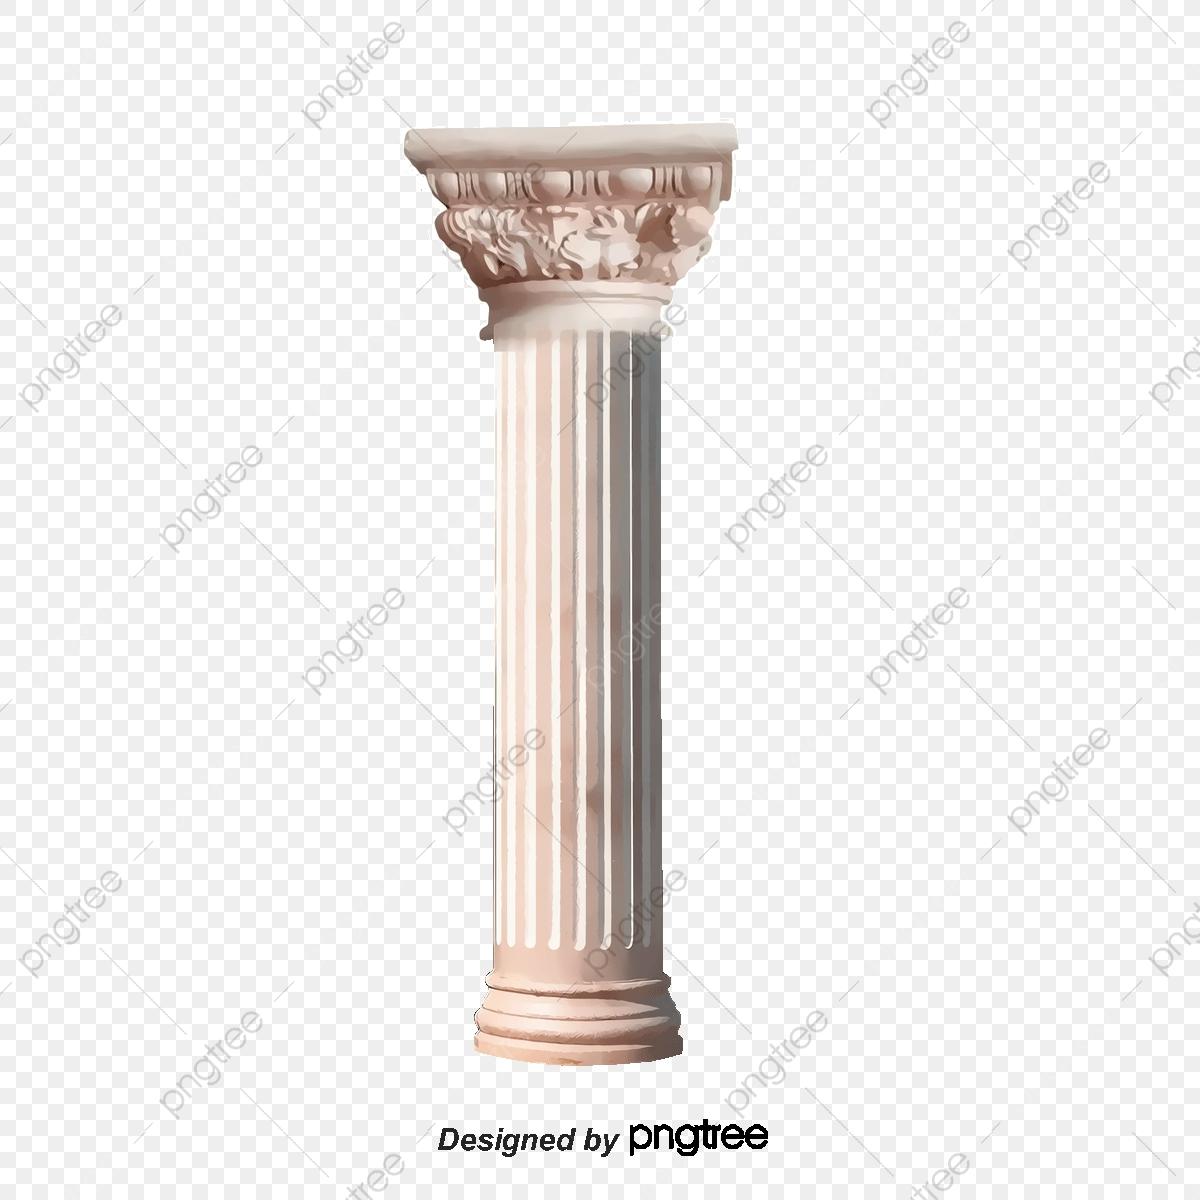 Pattern Pillars, Pattern, Pillar, Cream PNG Transparent.